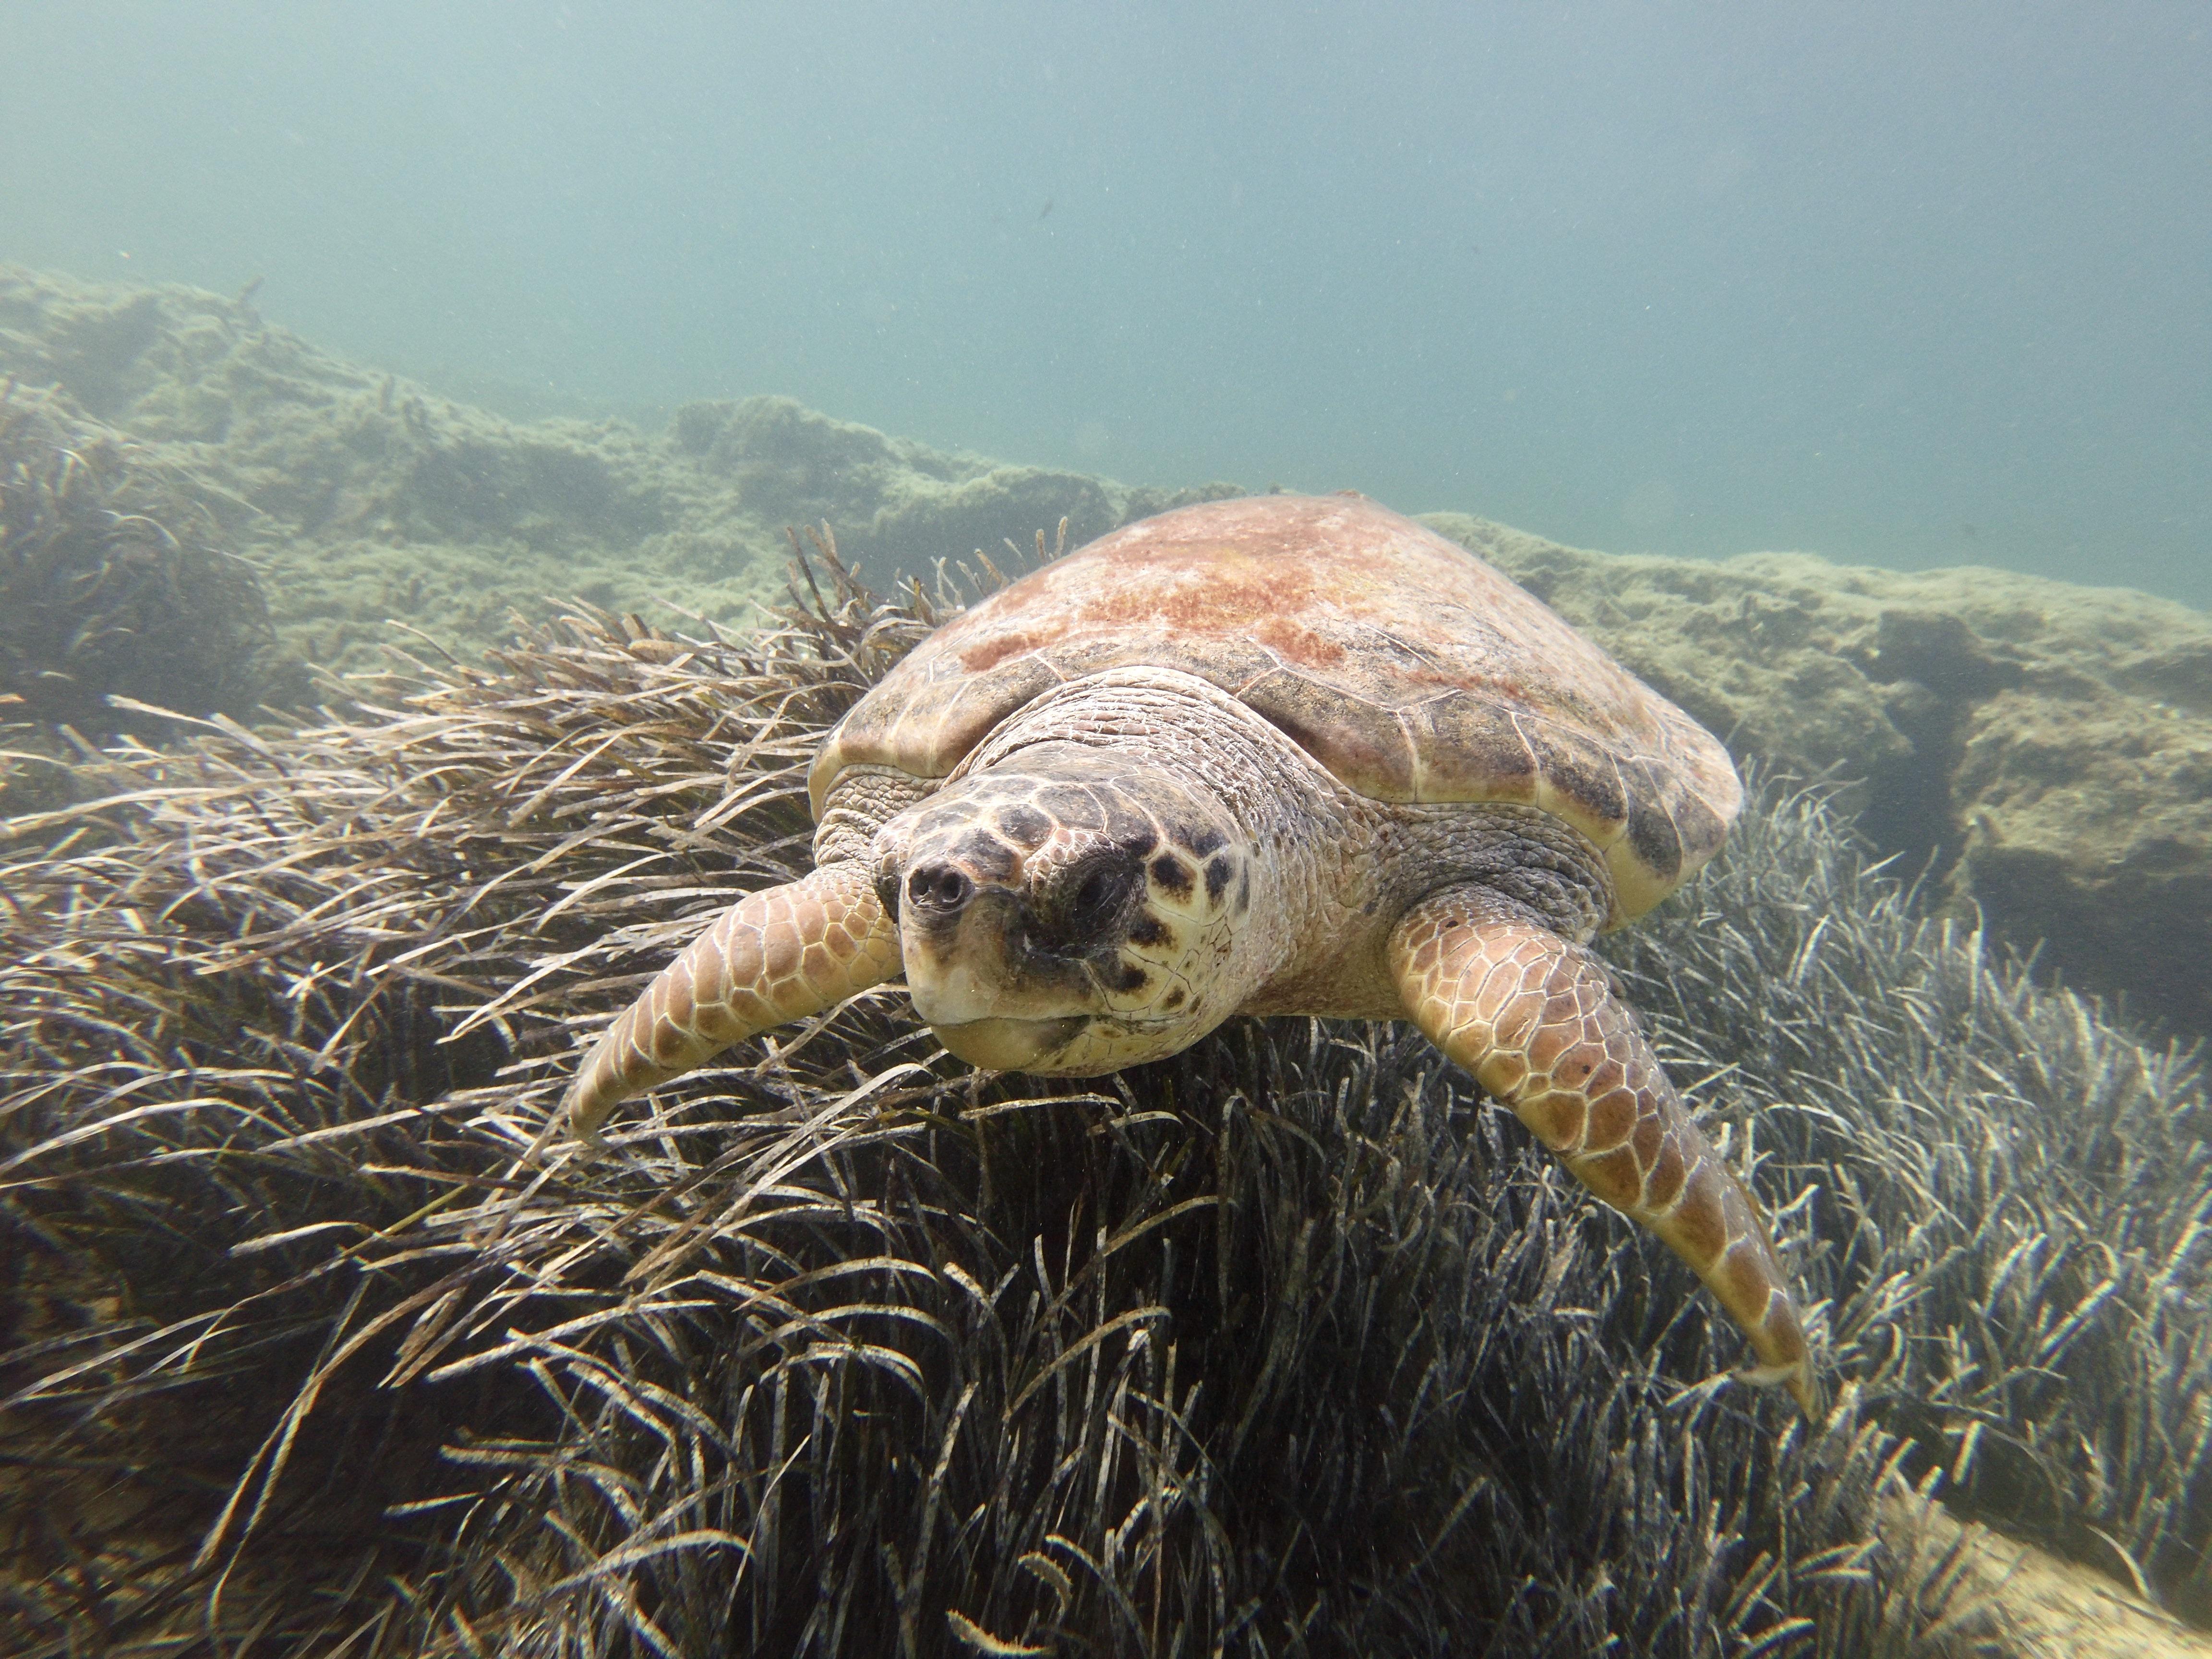 Turtle sight seeing - Kalliopi Dive College